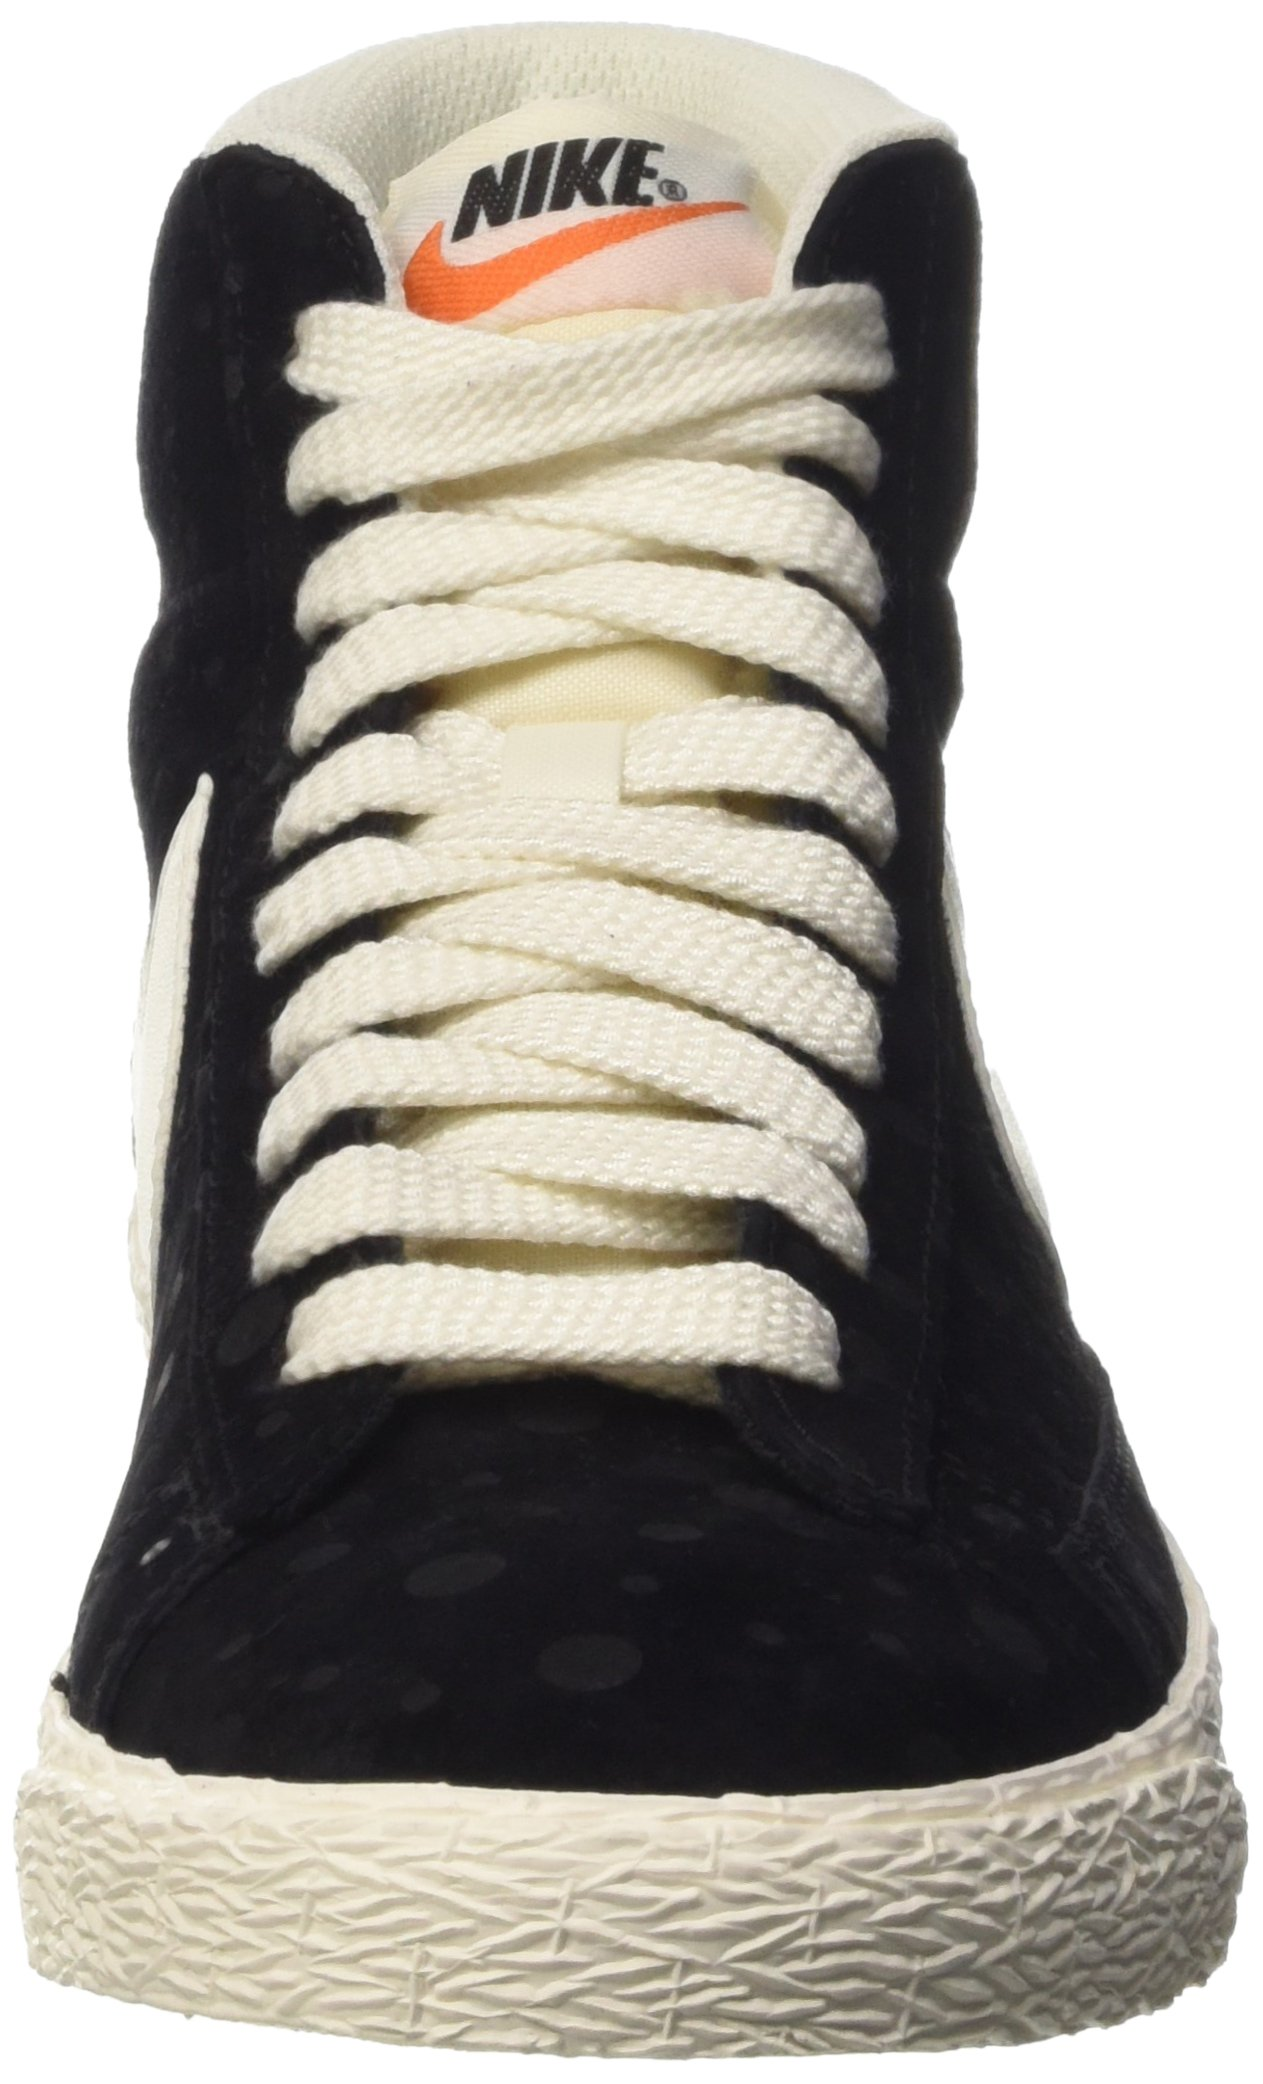 Nike Women's Blazer Mid Suede Vintage Black/White 518171-015 (SIZE: 8) by NIKE (Image #4)